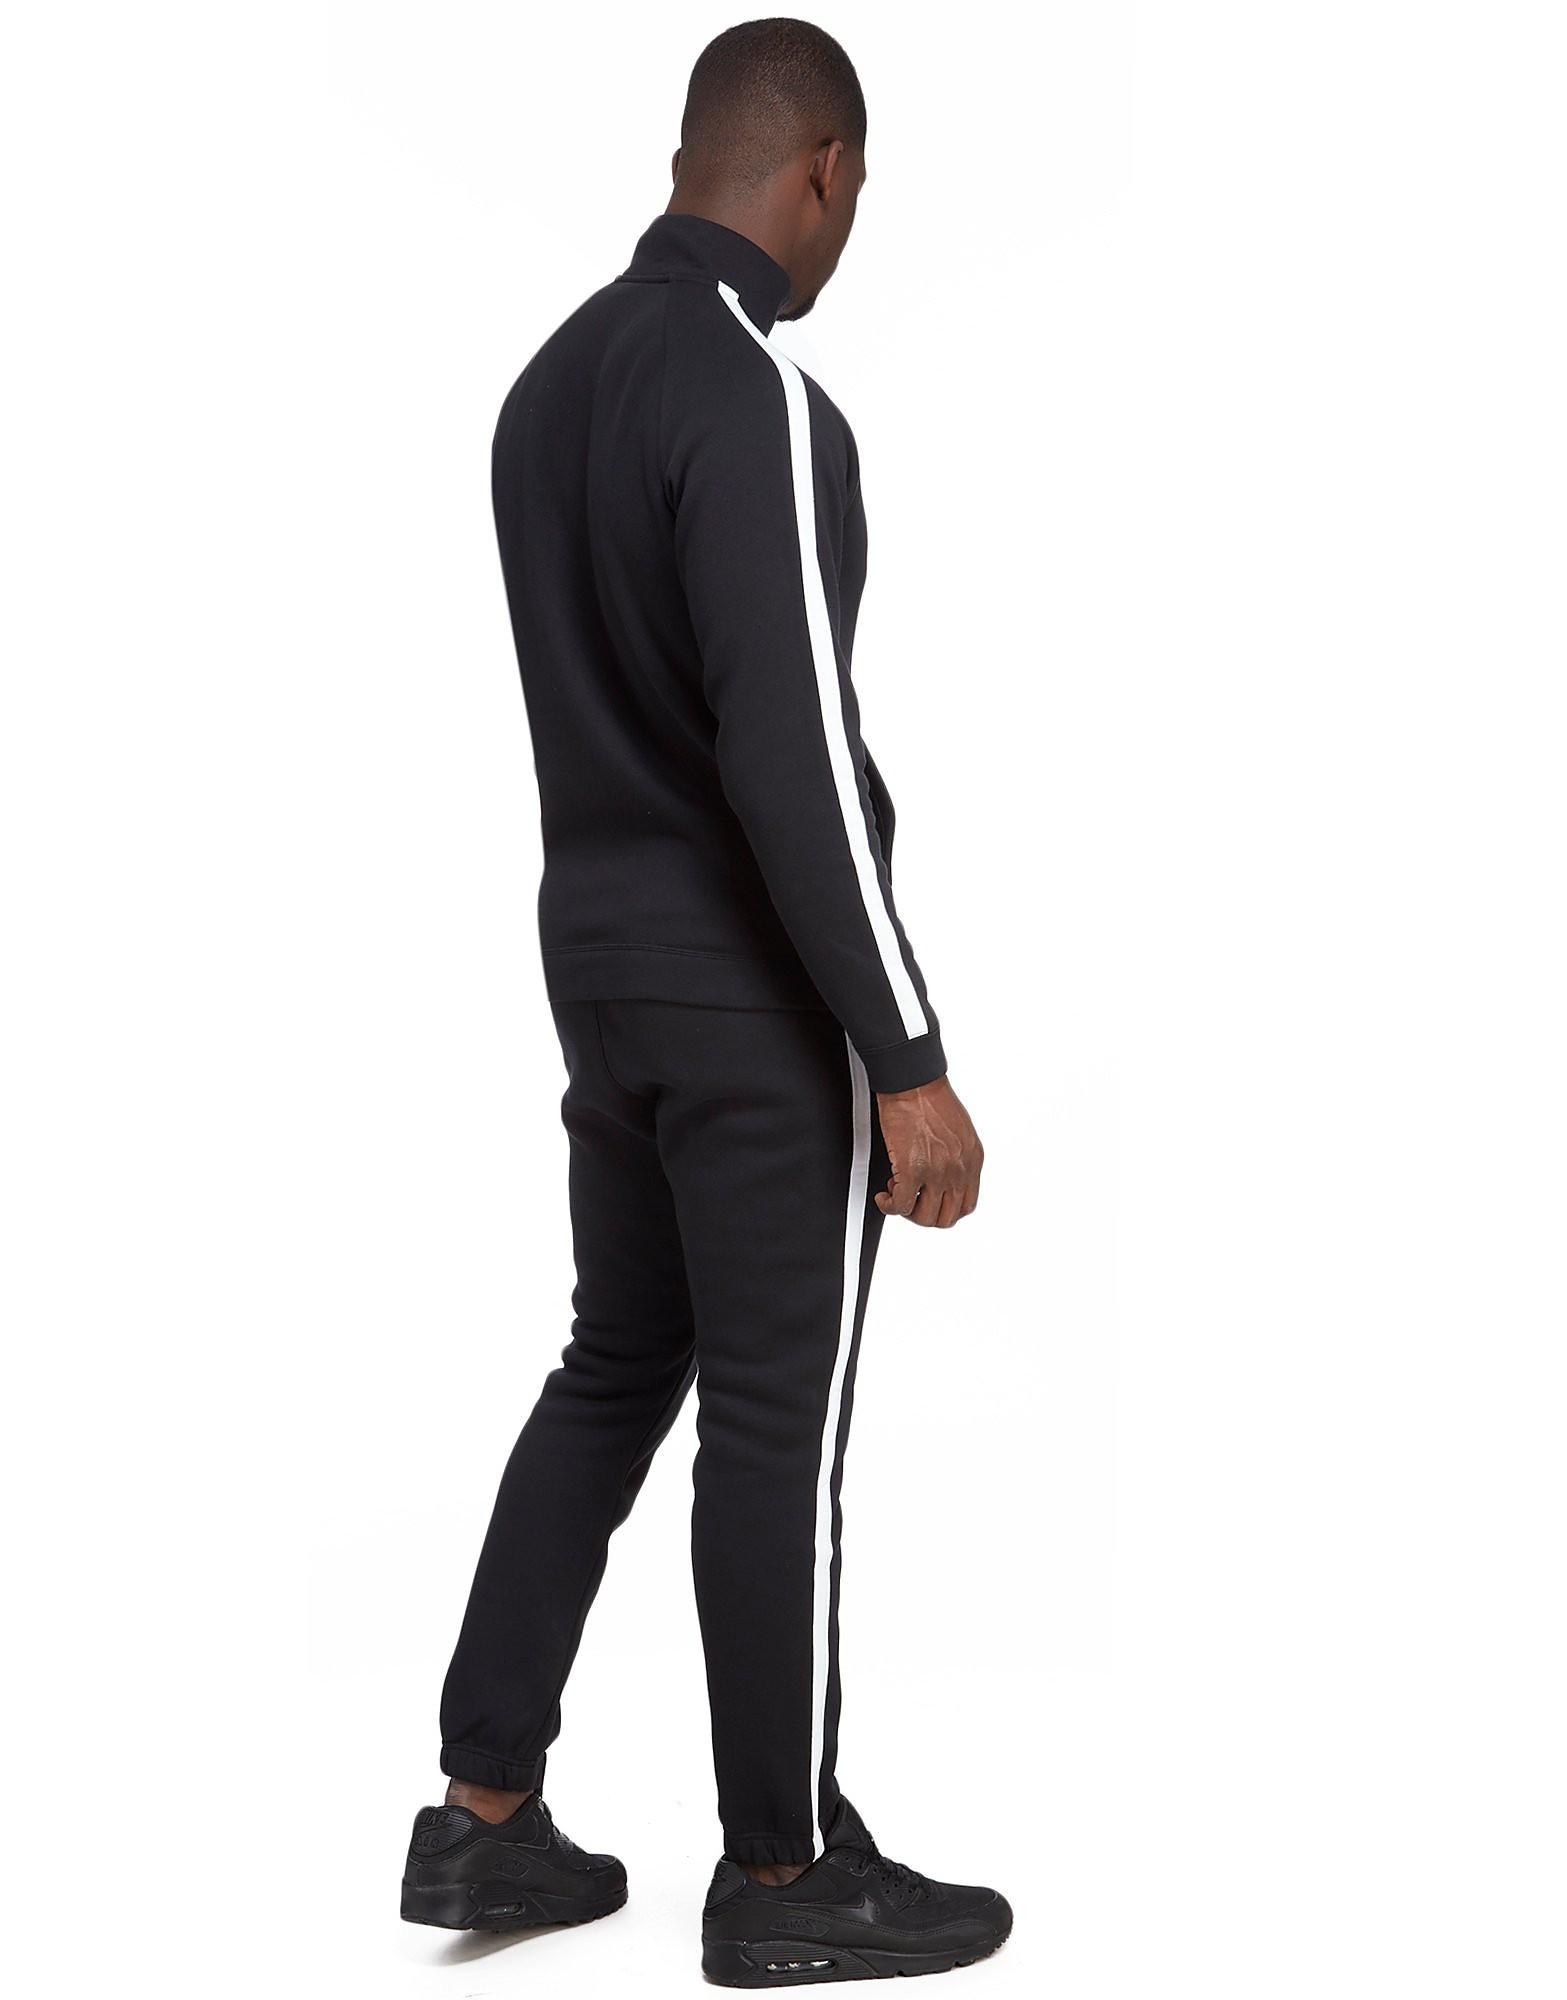 Nike Season Fleece Suit